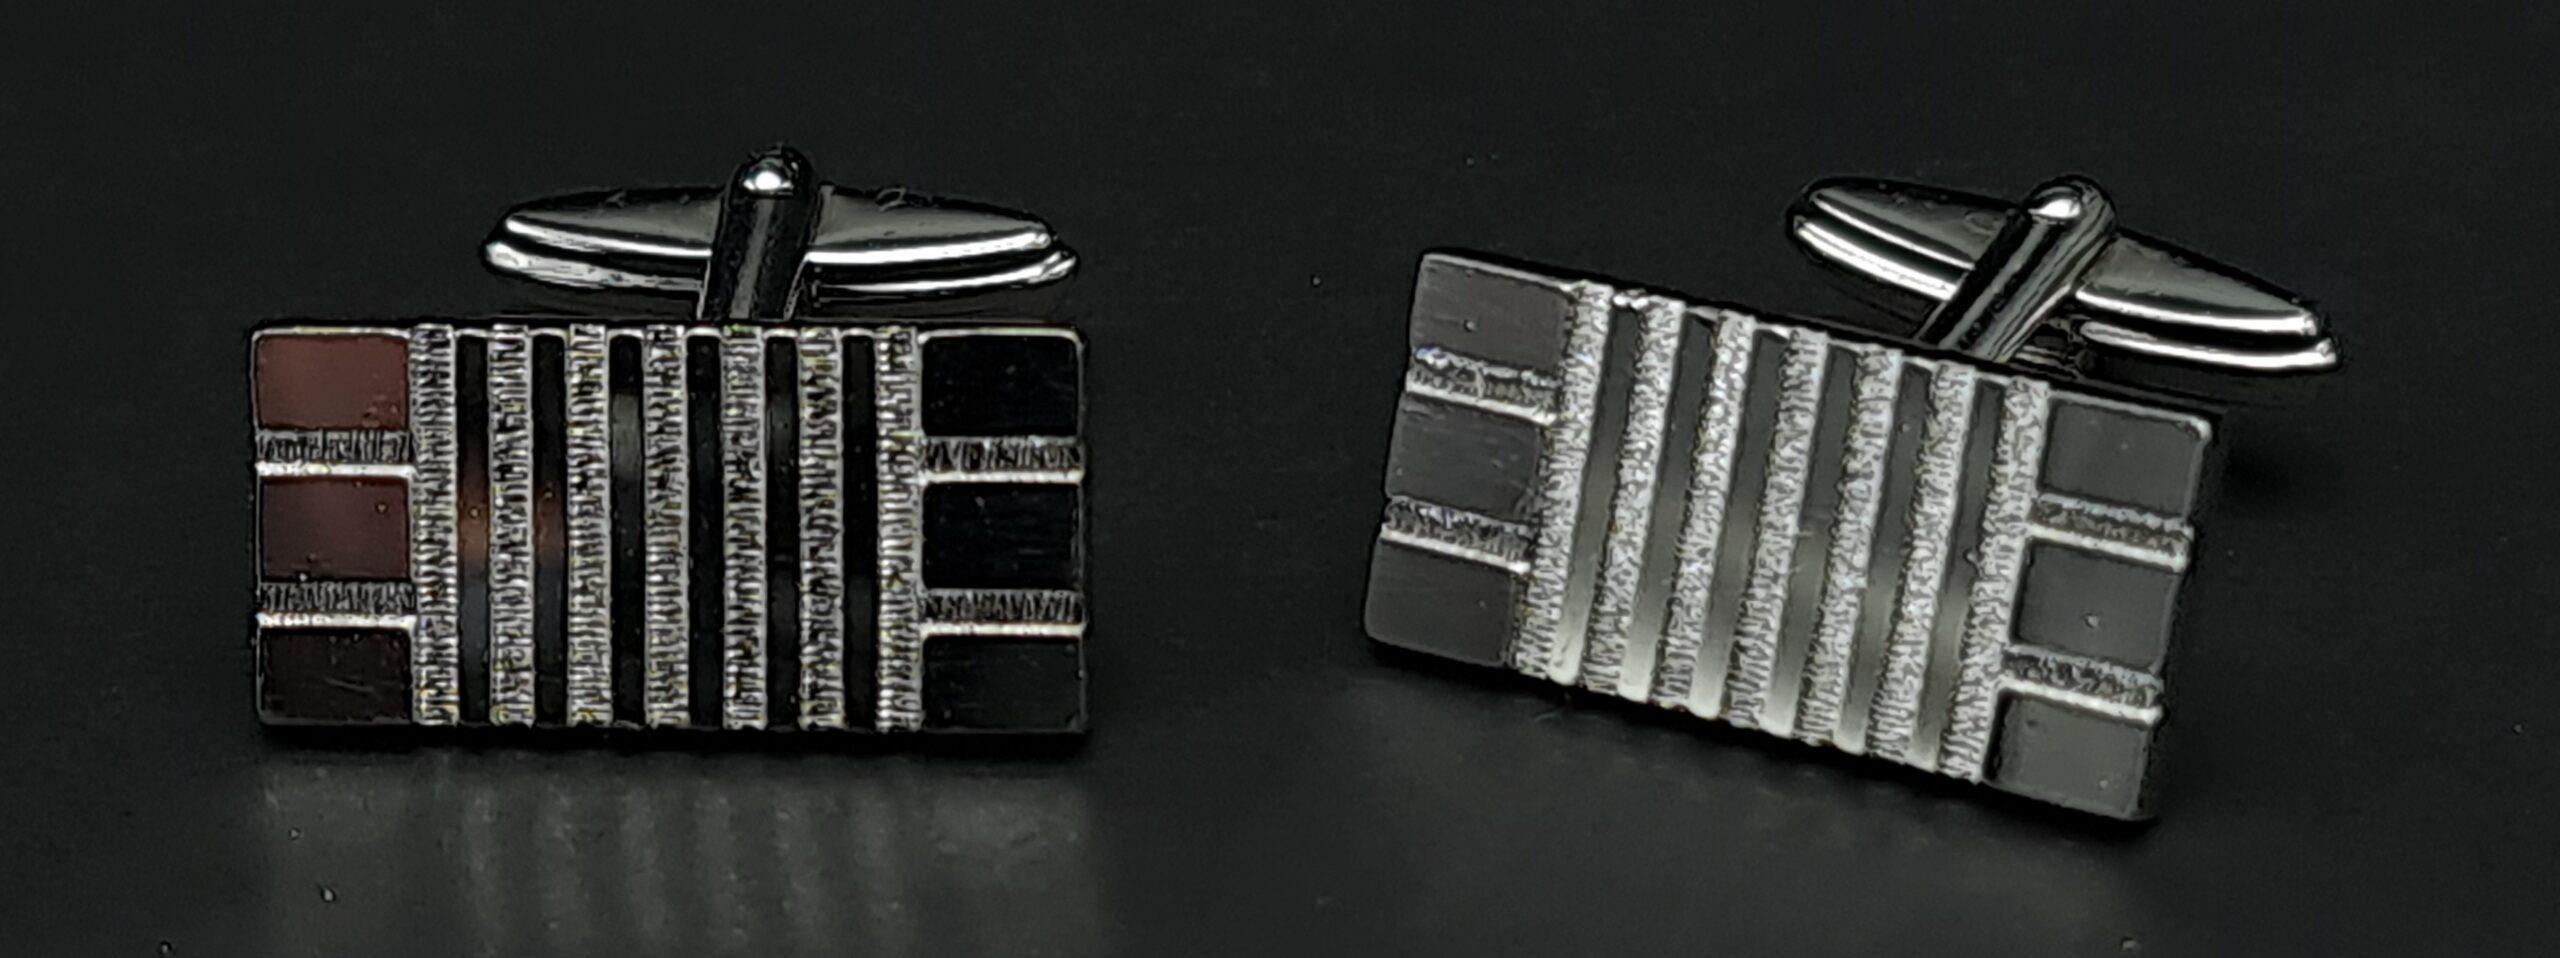 massief zilveren manchetknopen 835 zilver vintage zilveren manchetknopen retro zilver manchetknopen 835 silver cufflinks vintage skoander.com